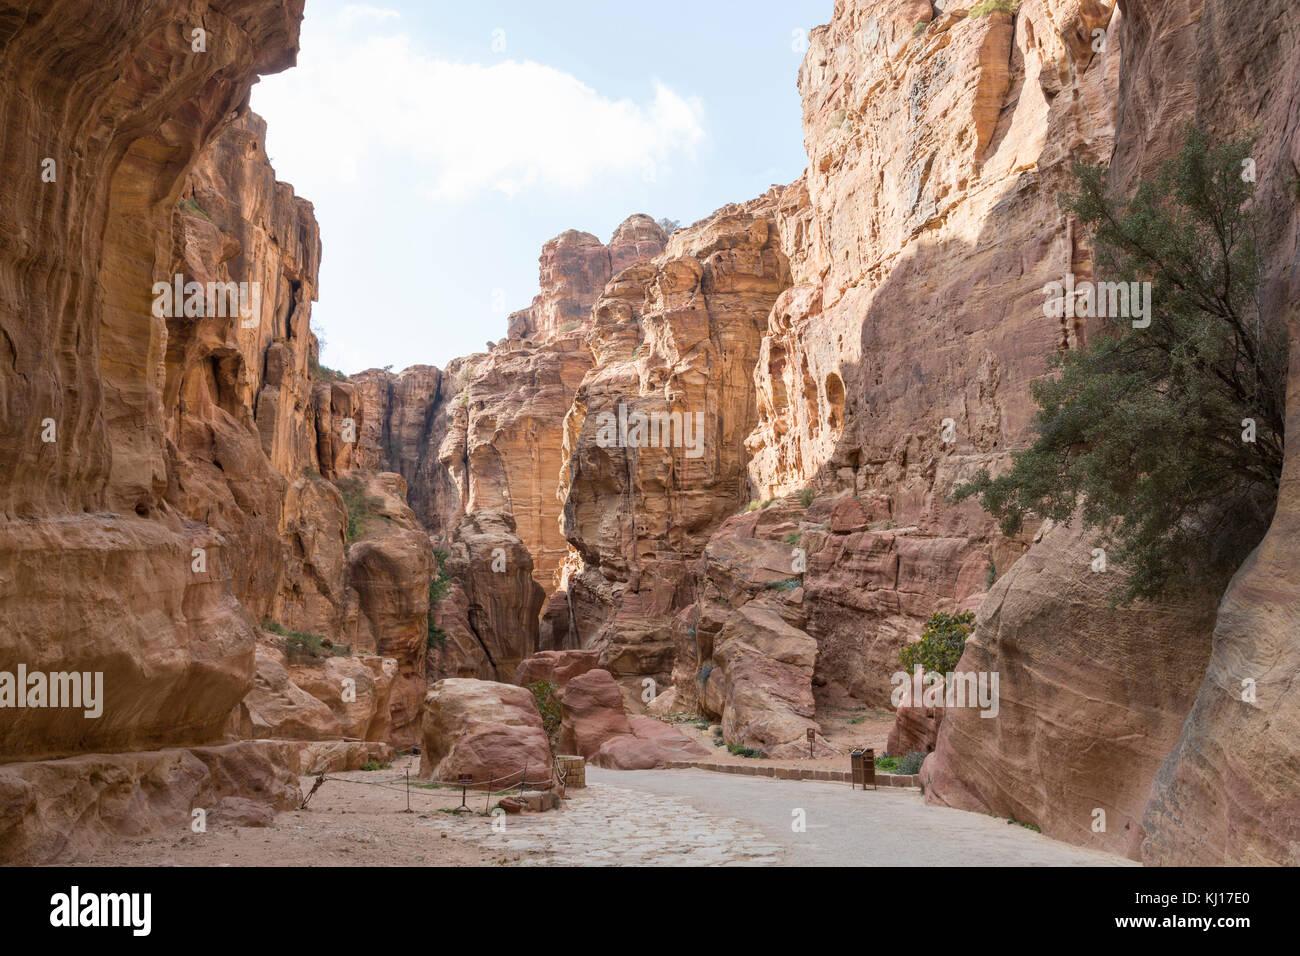 Canyon entrance to the lost city of petra, Jordan Stock Photo